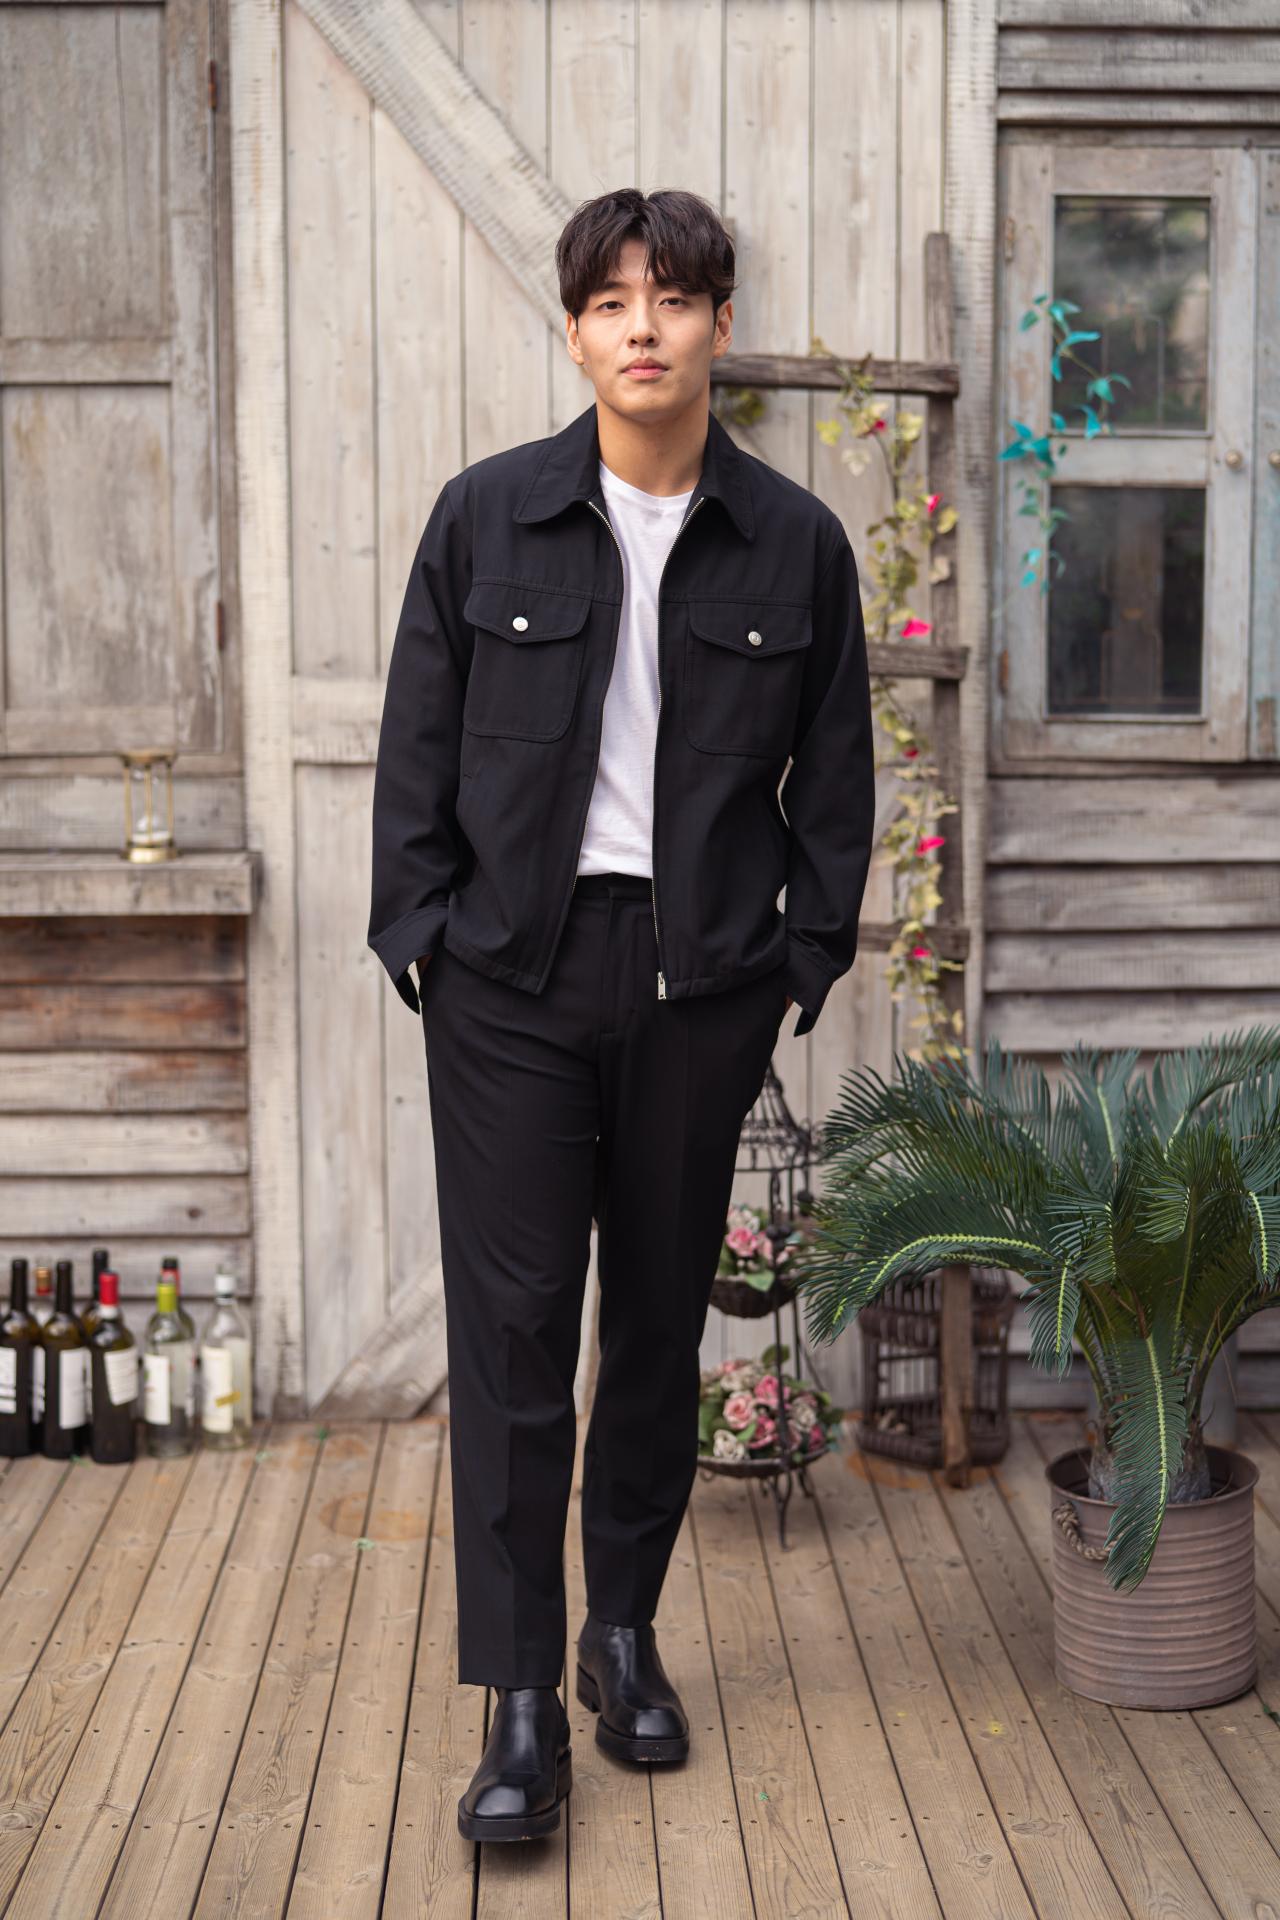 Kang Ha-neul (Kidari ENT and Sony Pictures Entertainment Korea)